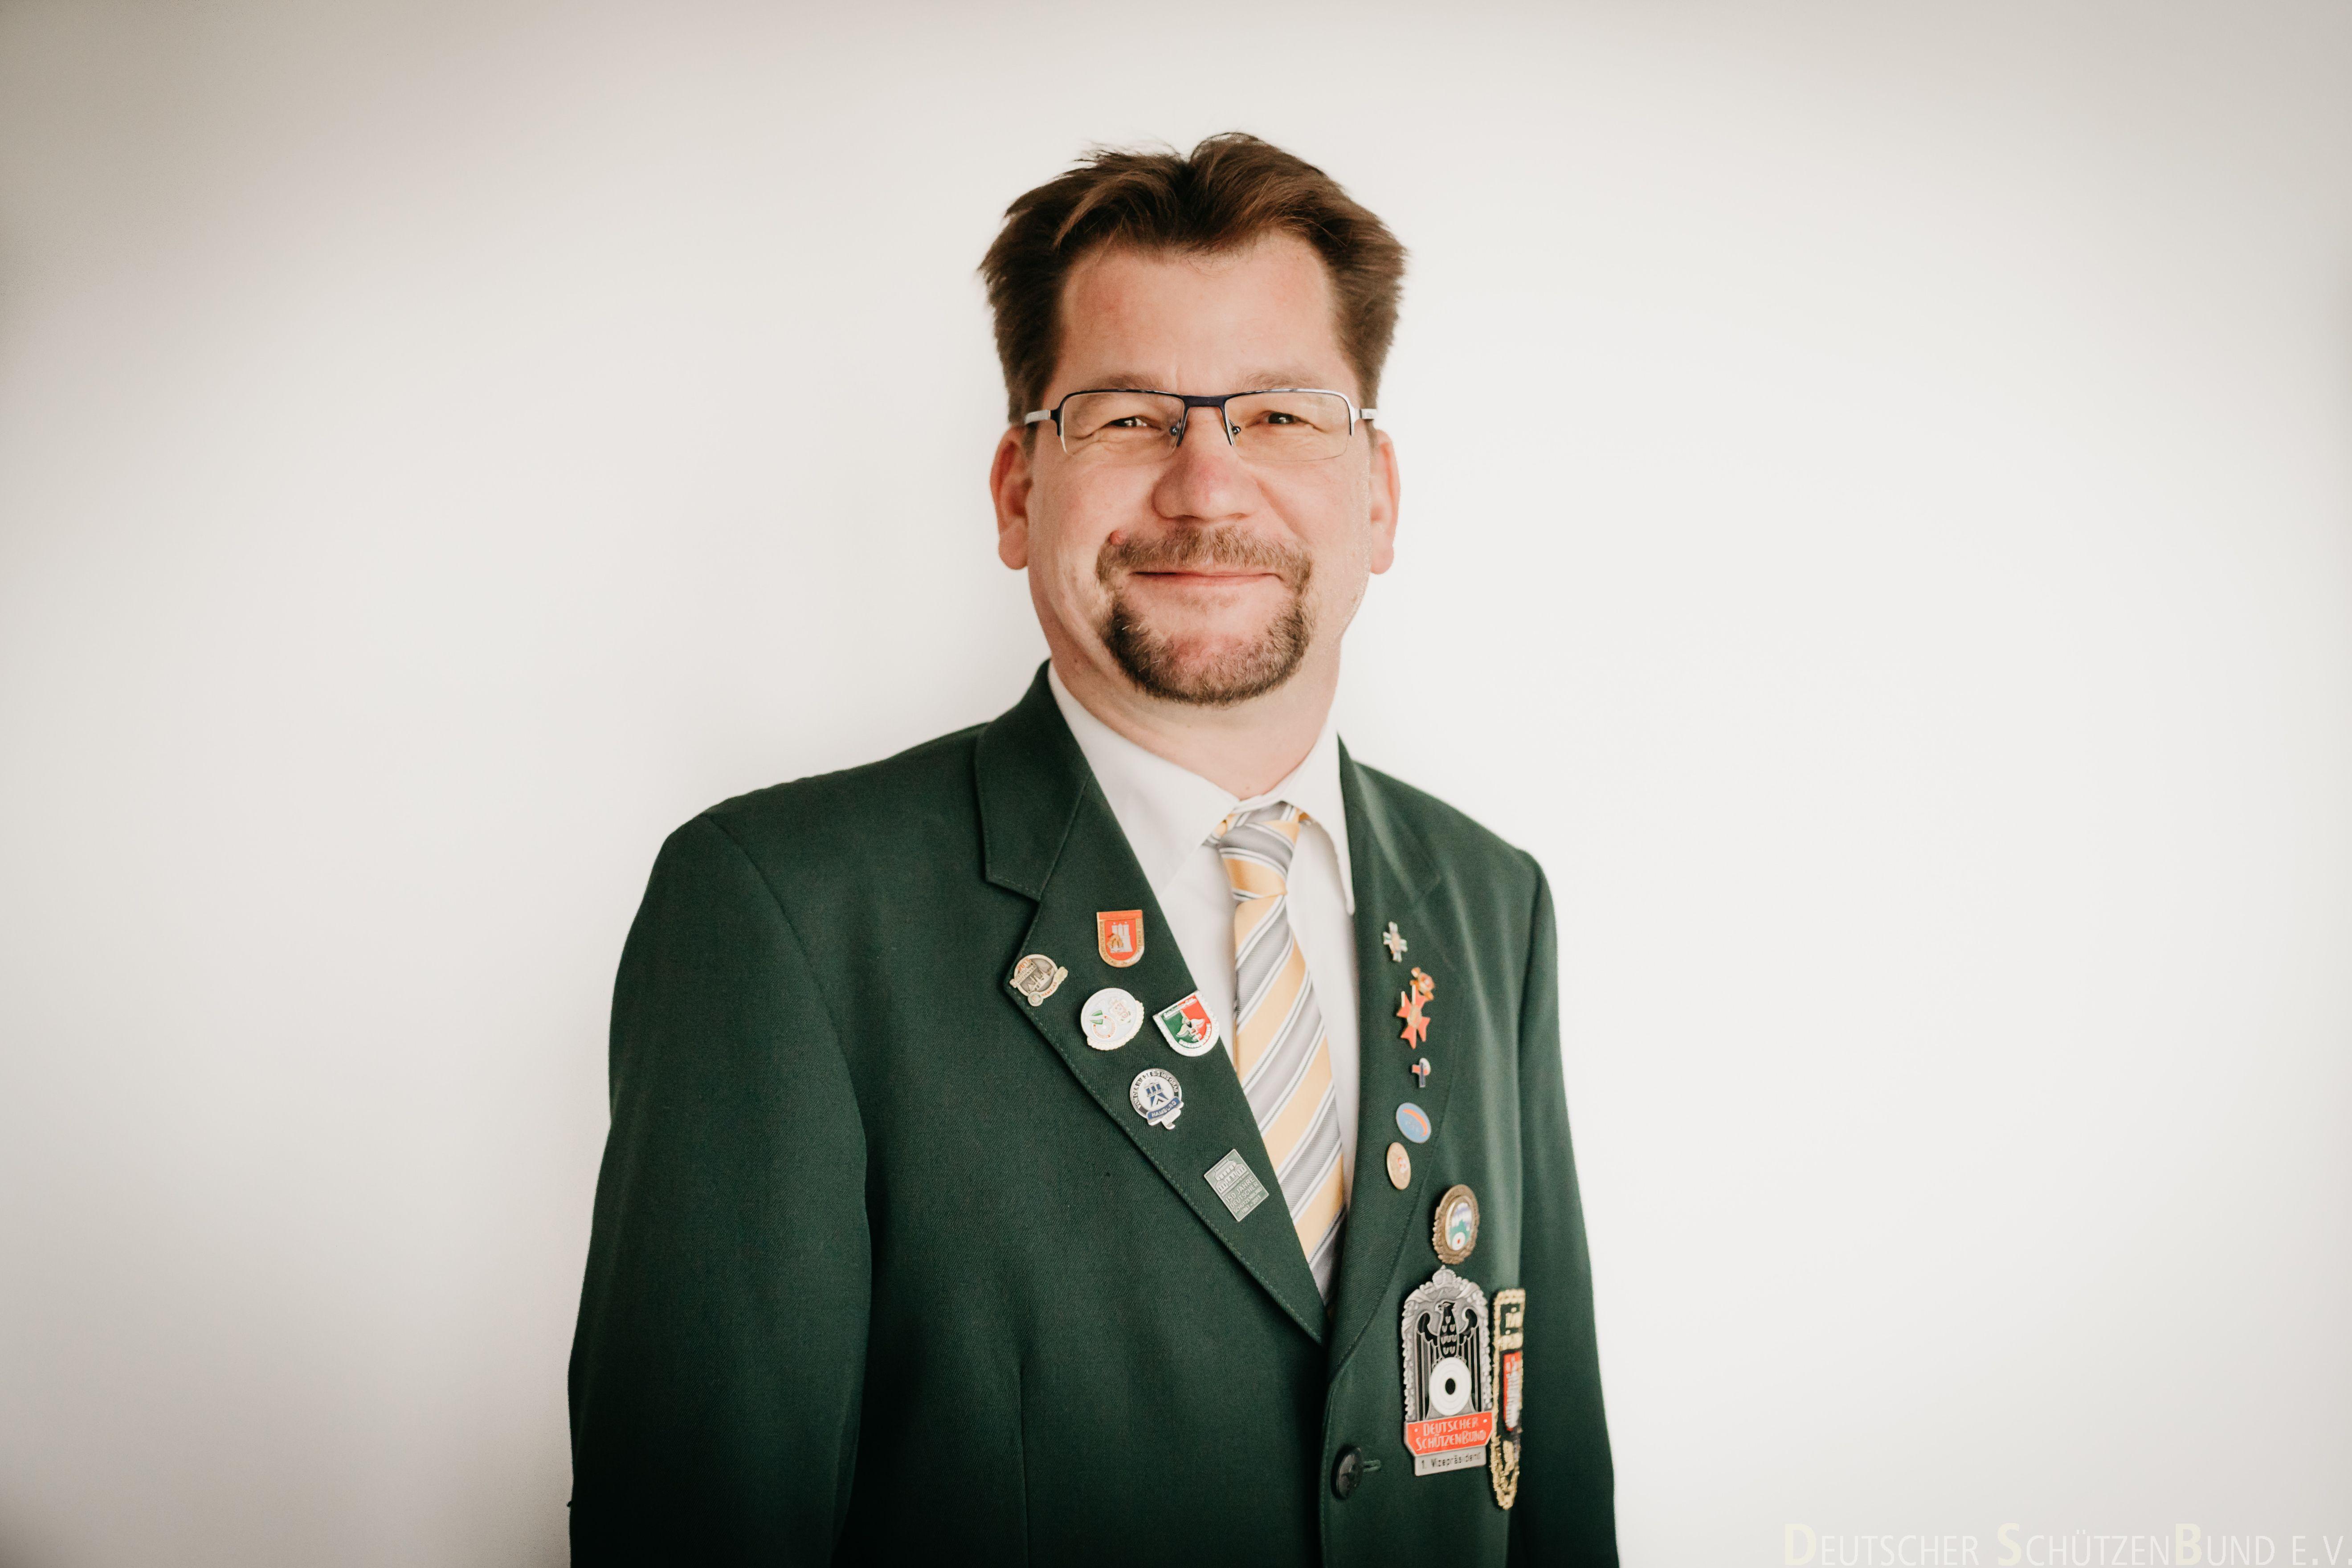 Lars Bathke - 1. Vizepräsident